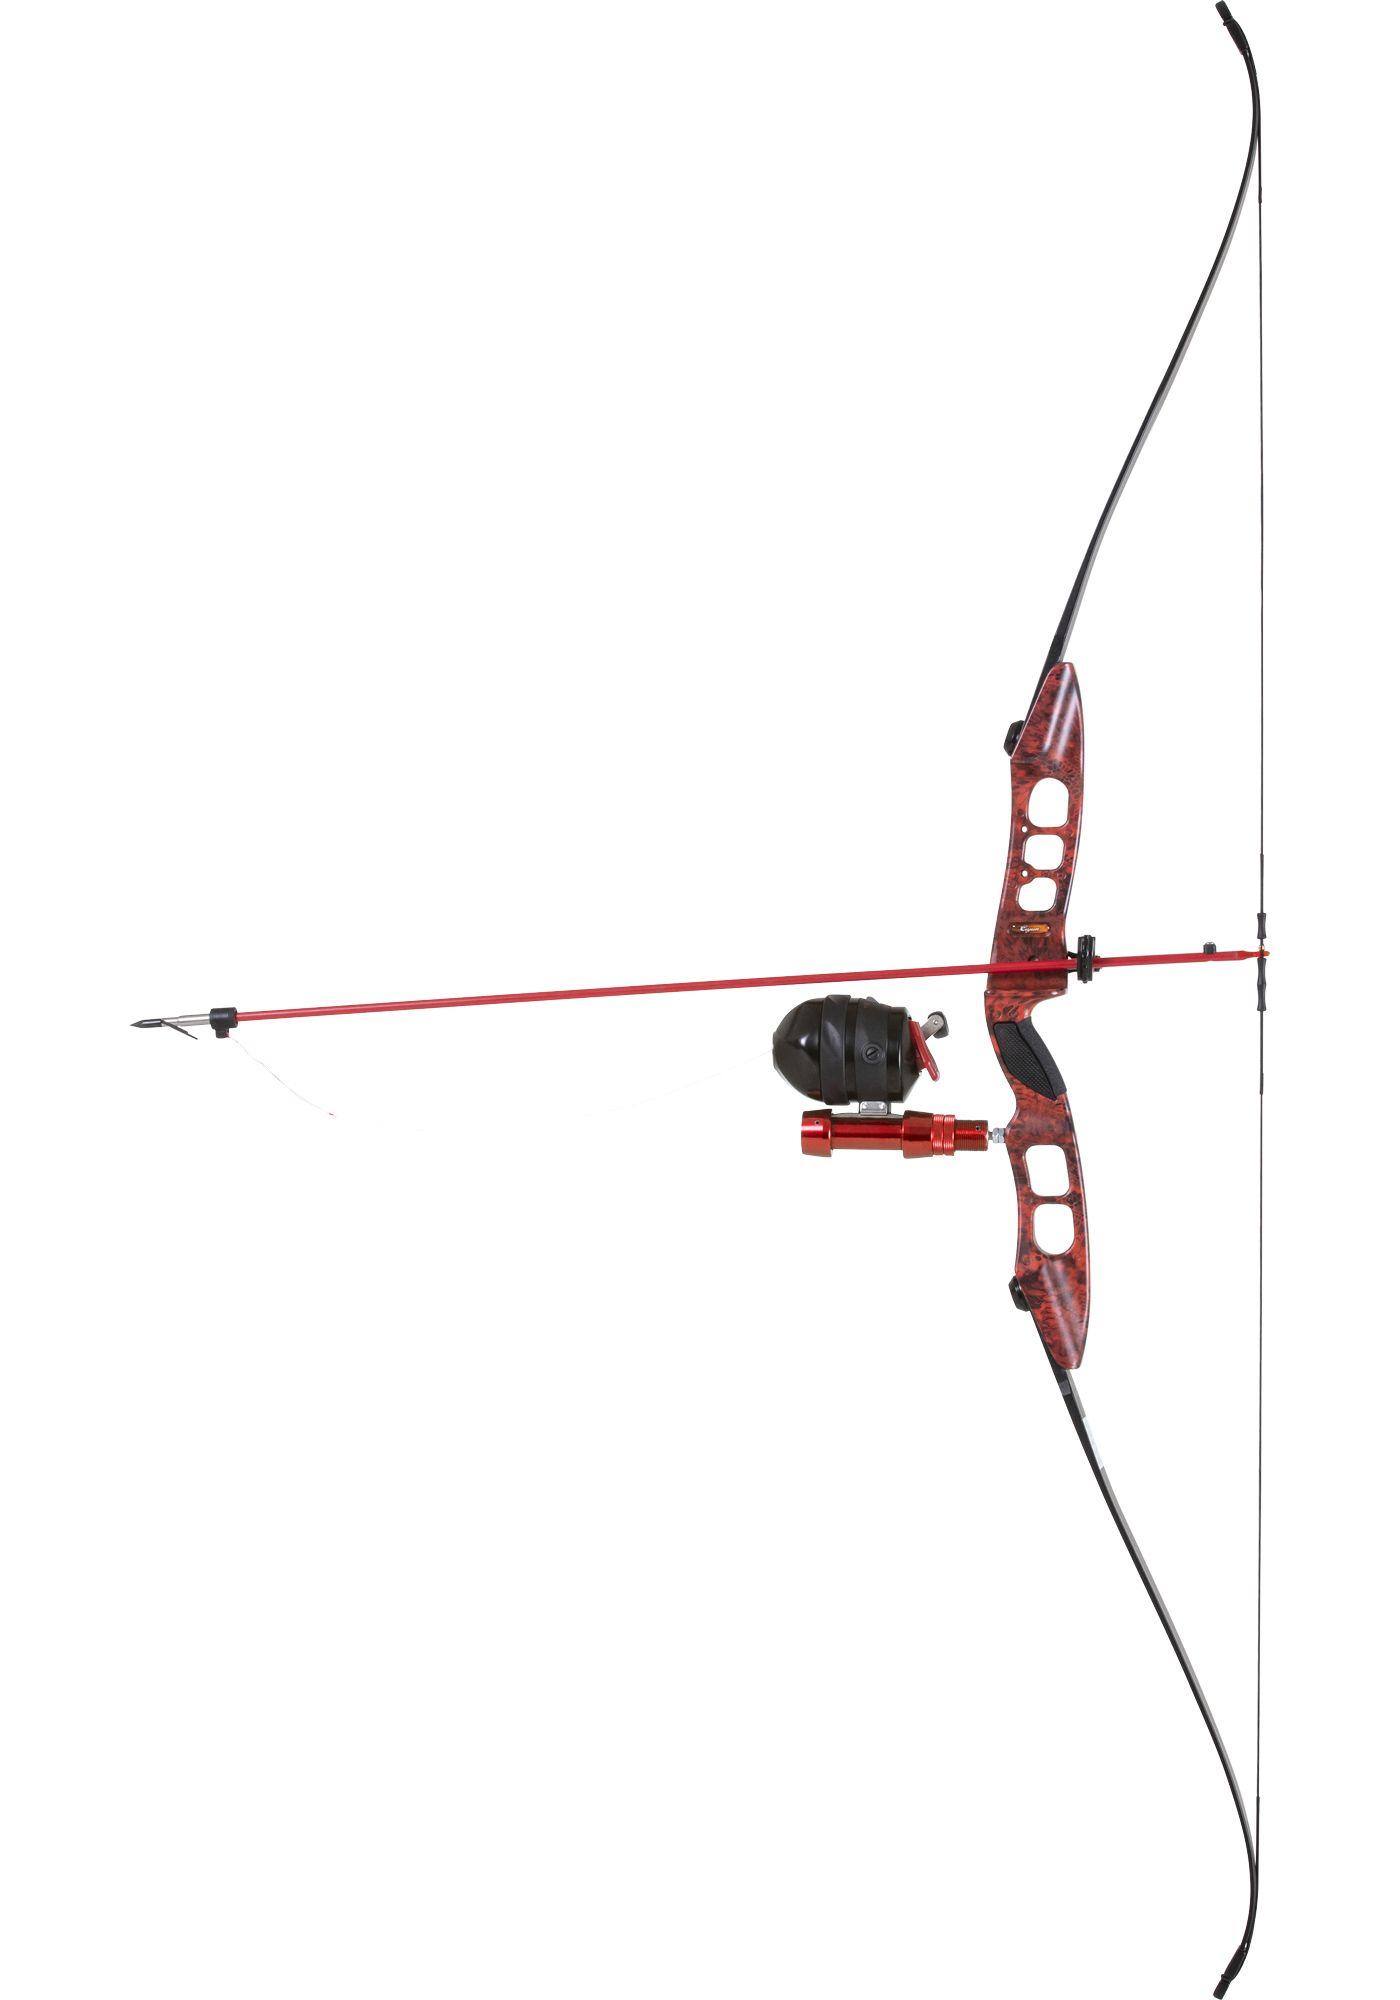 Cajun Bowfishing Fish Stick Pro RTF Bowfishing Bow Package